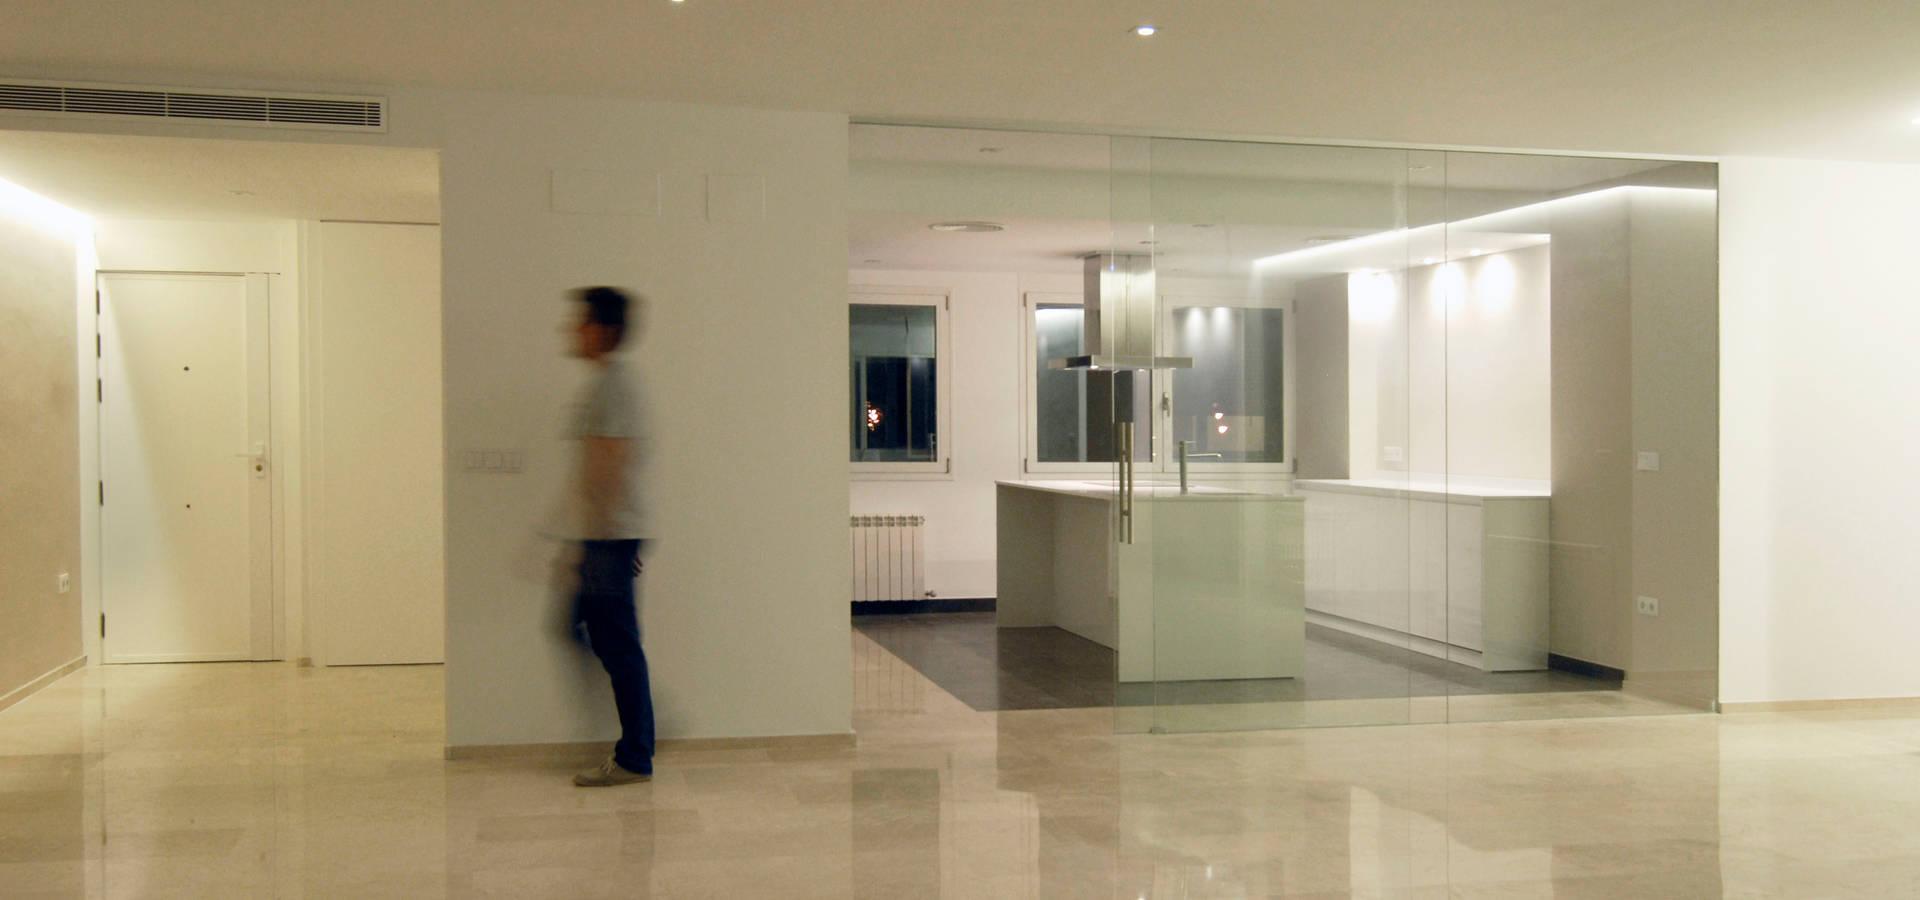 Cm4 arquitectos arquitectos en sevilla homify - Cm arquitectos ...